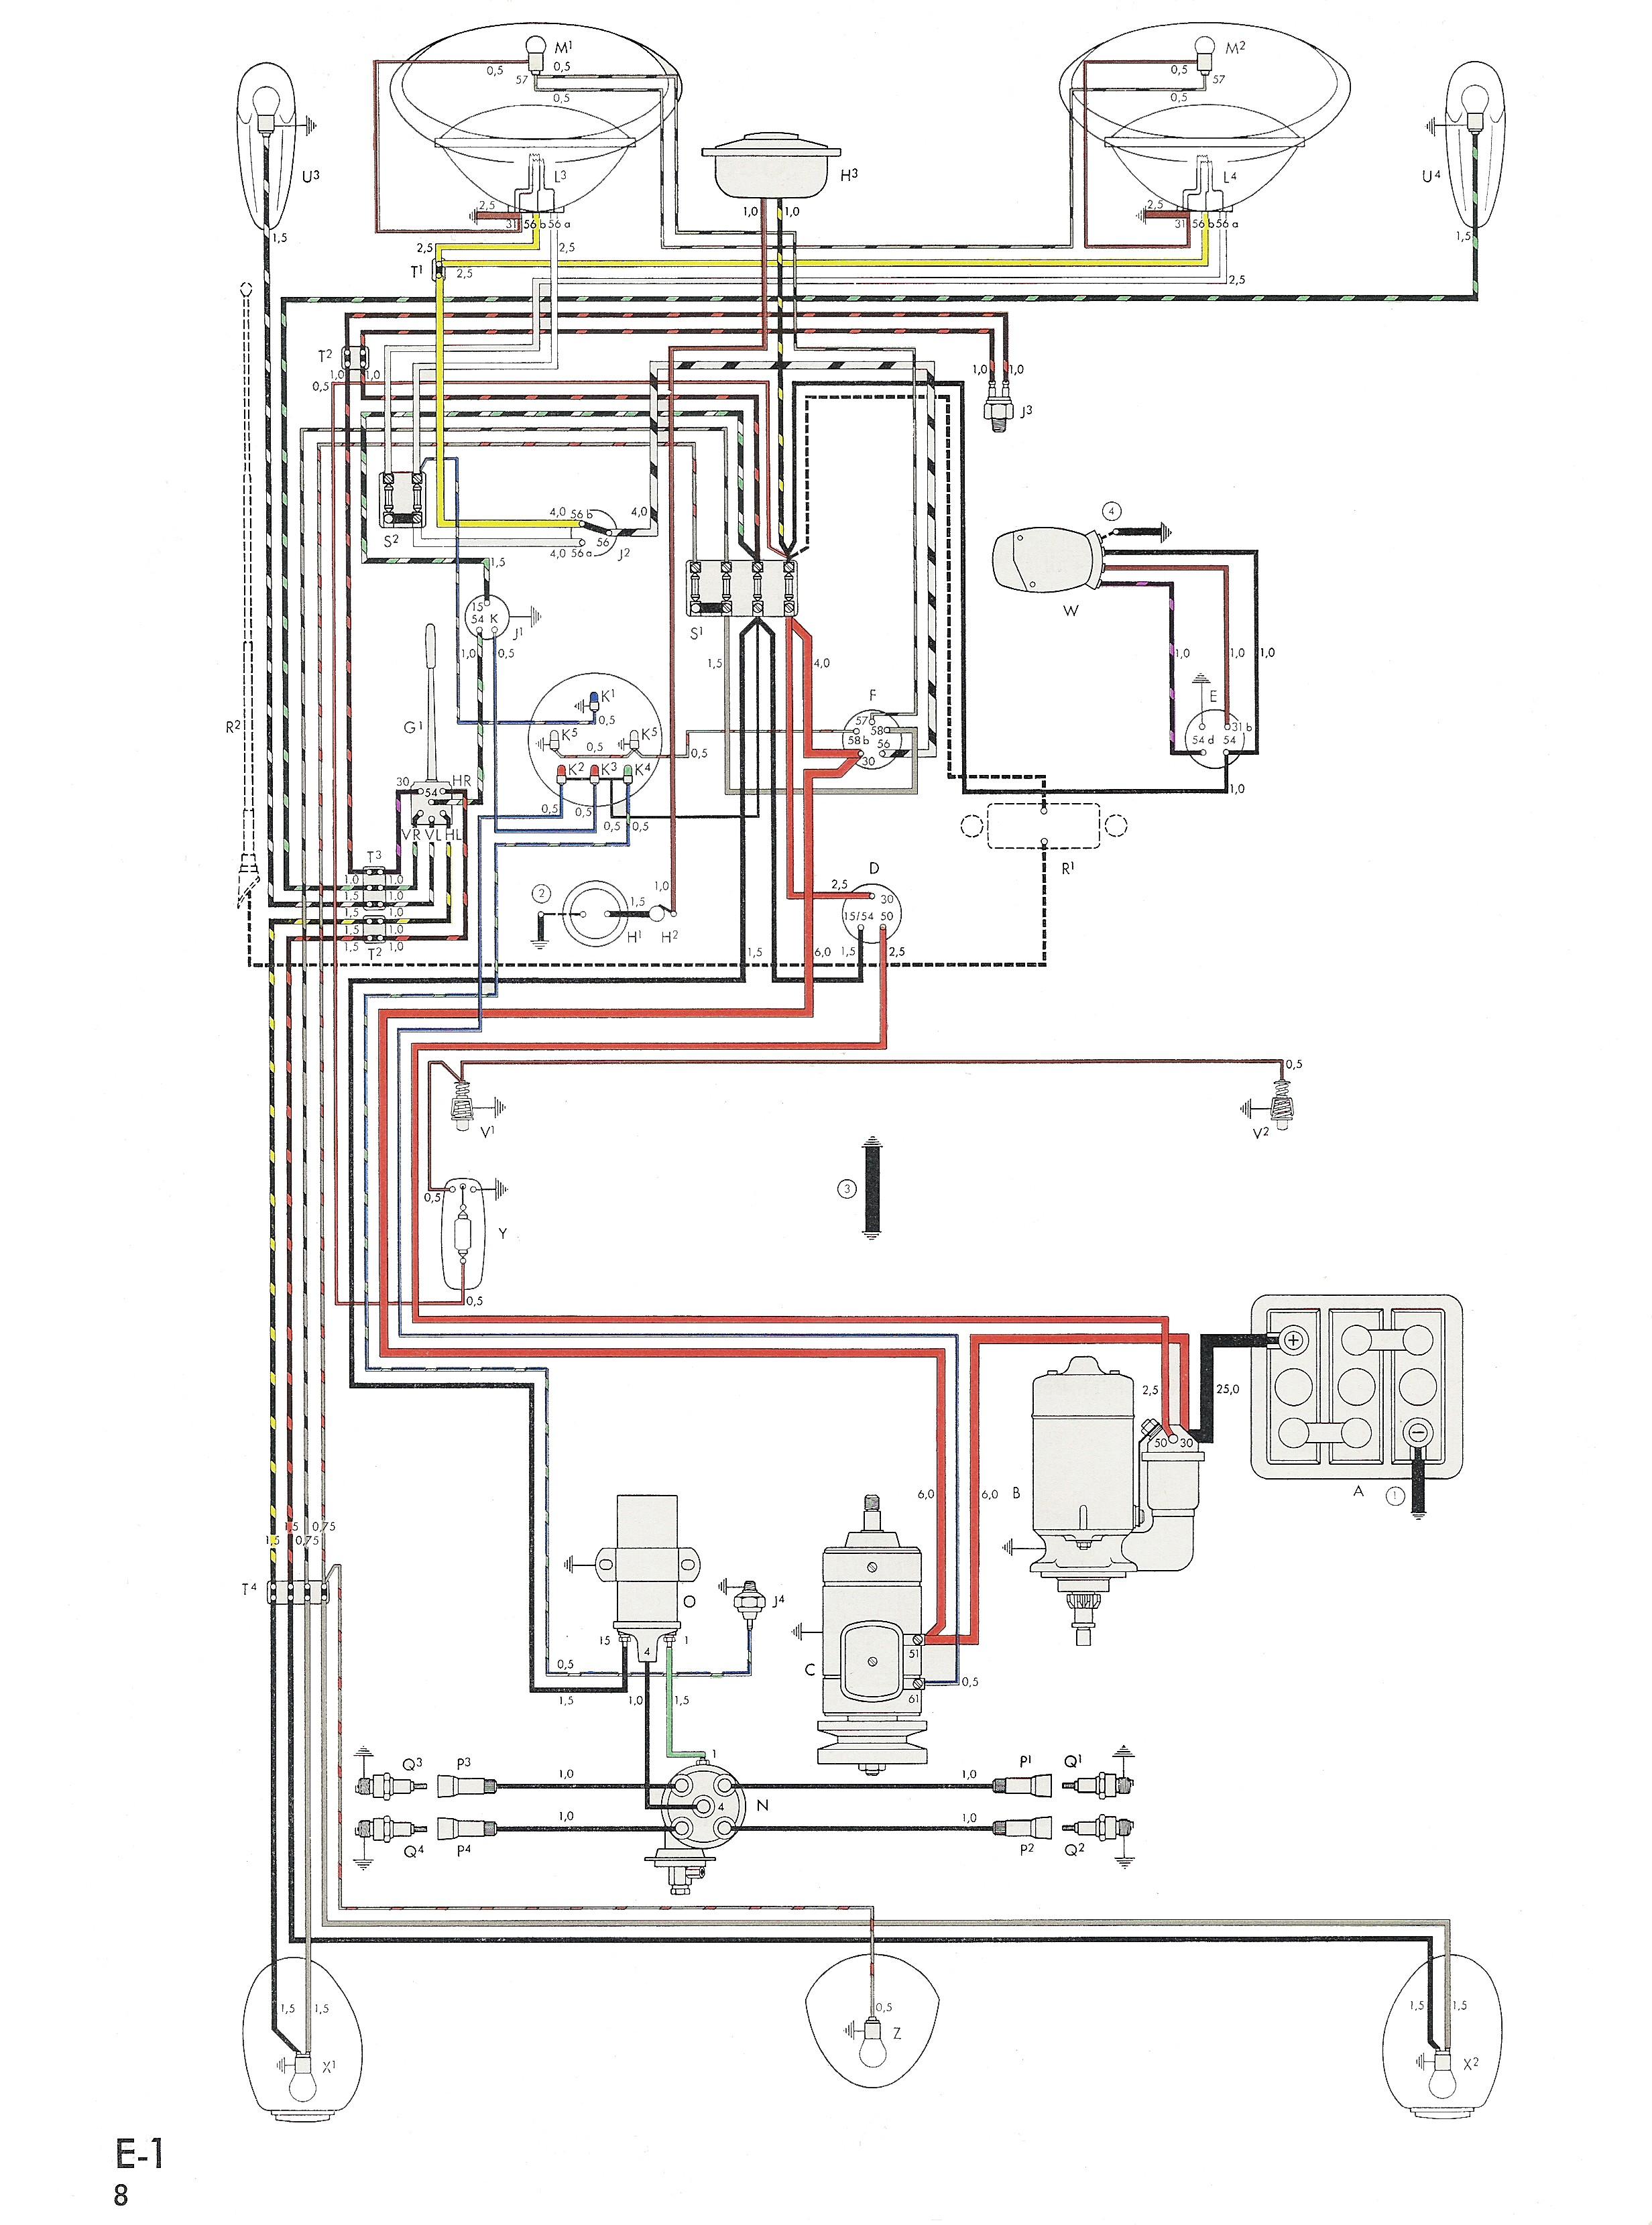 2002 Vw Jetta Engine Diagram 58 Vw Alternator Wiring Another Blog About Wiring Diagram • Of 2002 Vw Jetta Engine Diagram